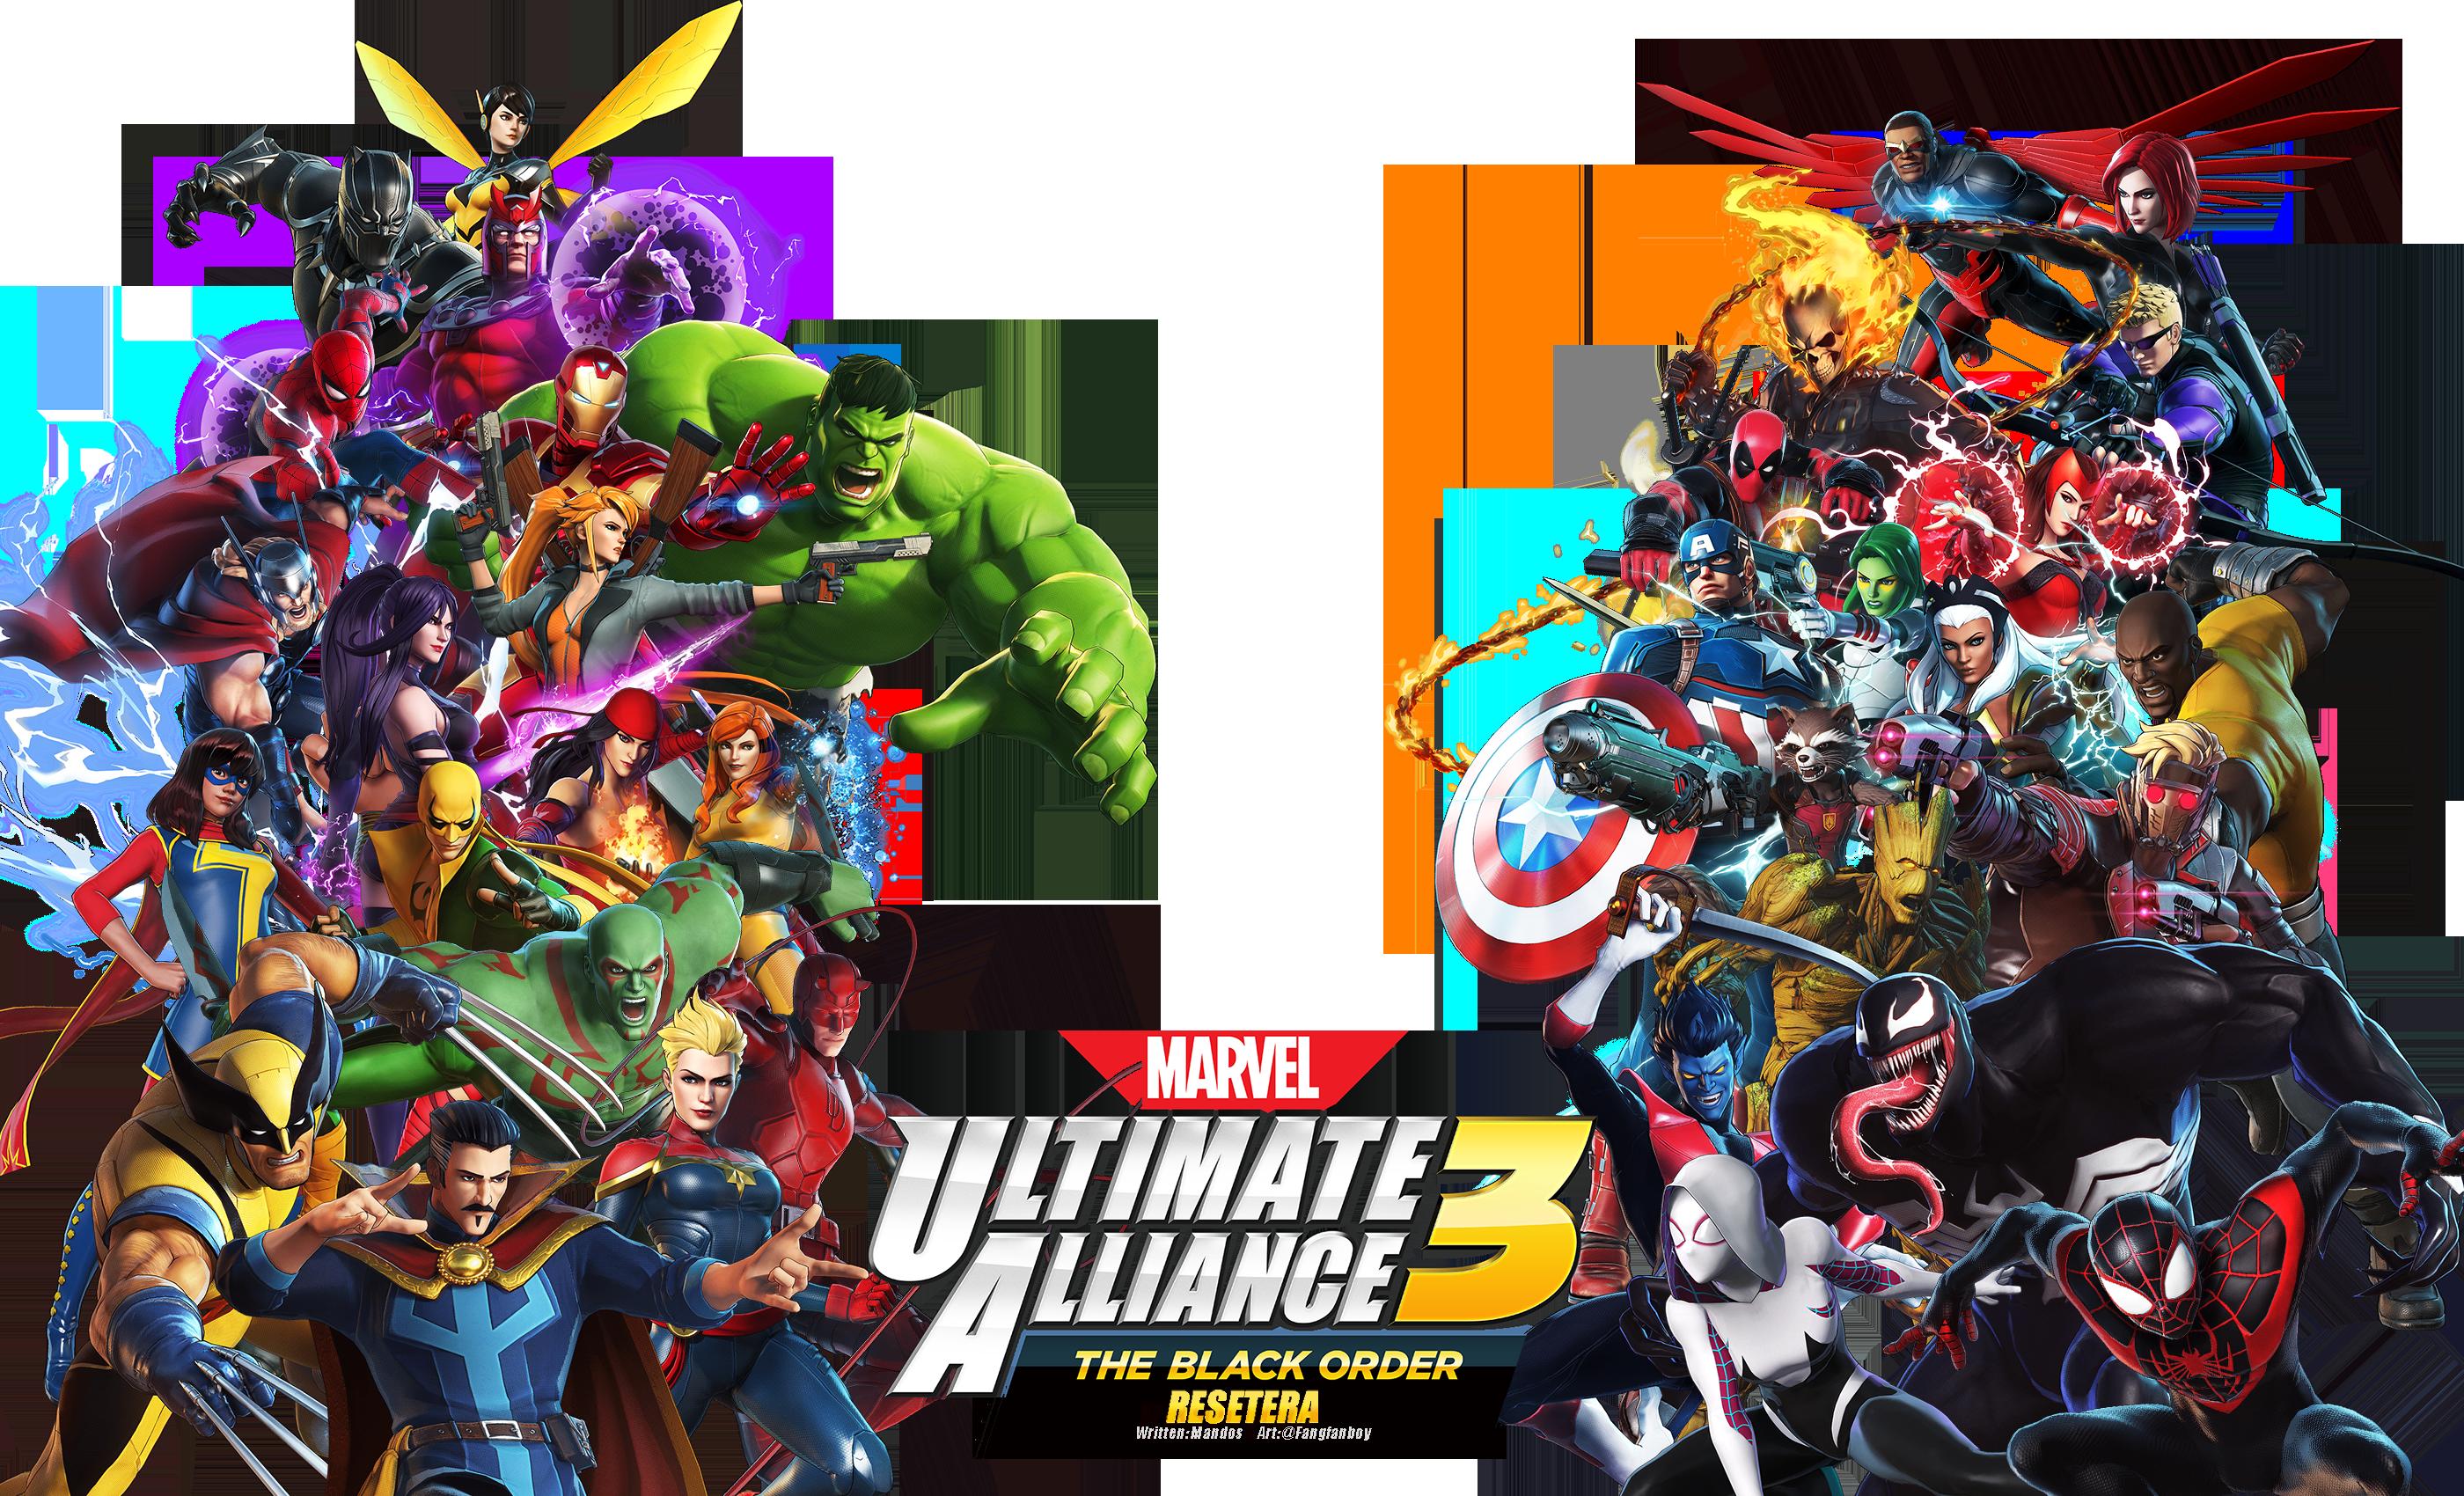 Marvel Ultimate Alliance 3 The Black Order Ot Marvel S Knights